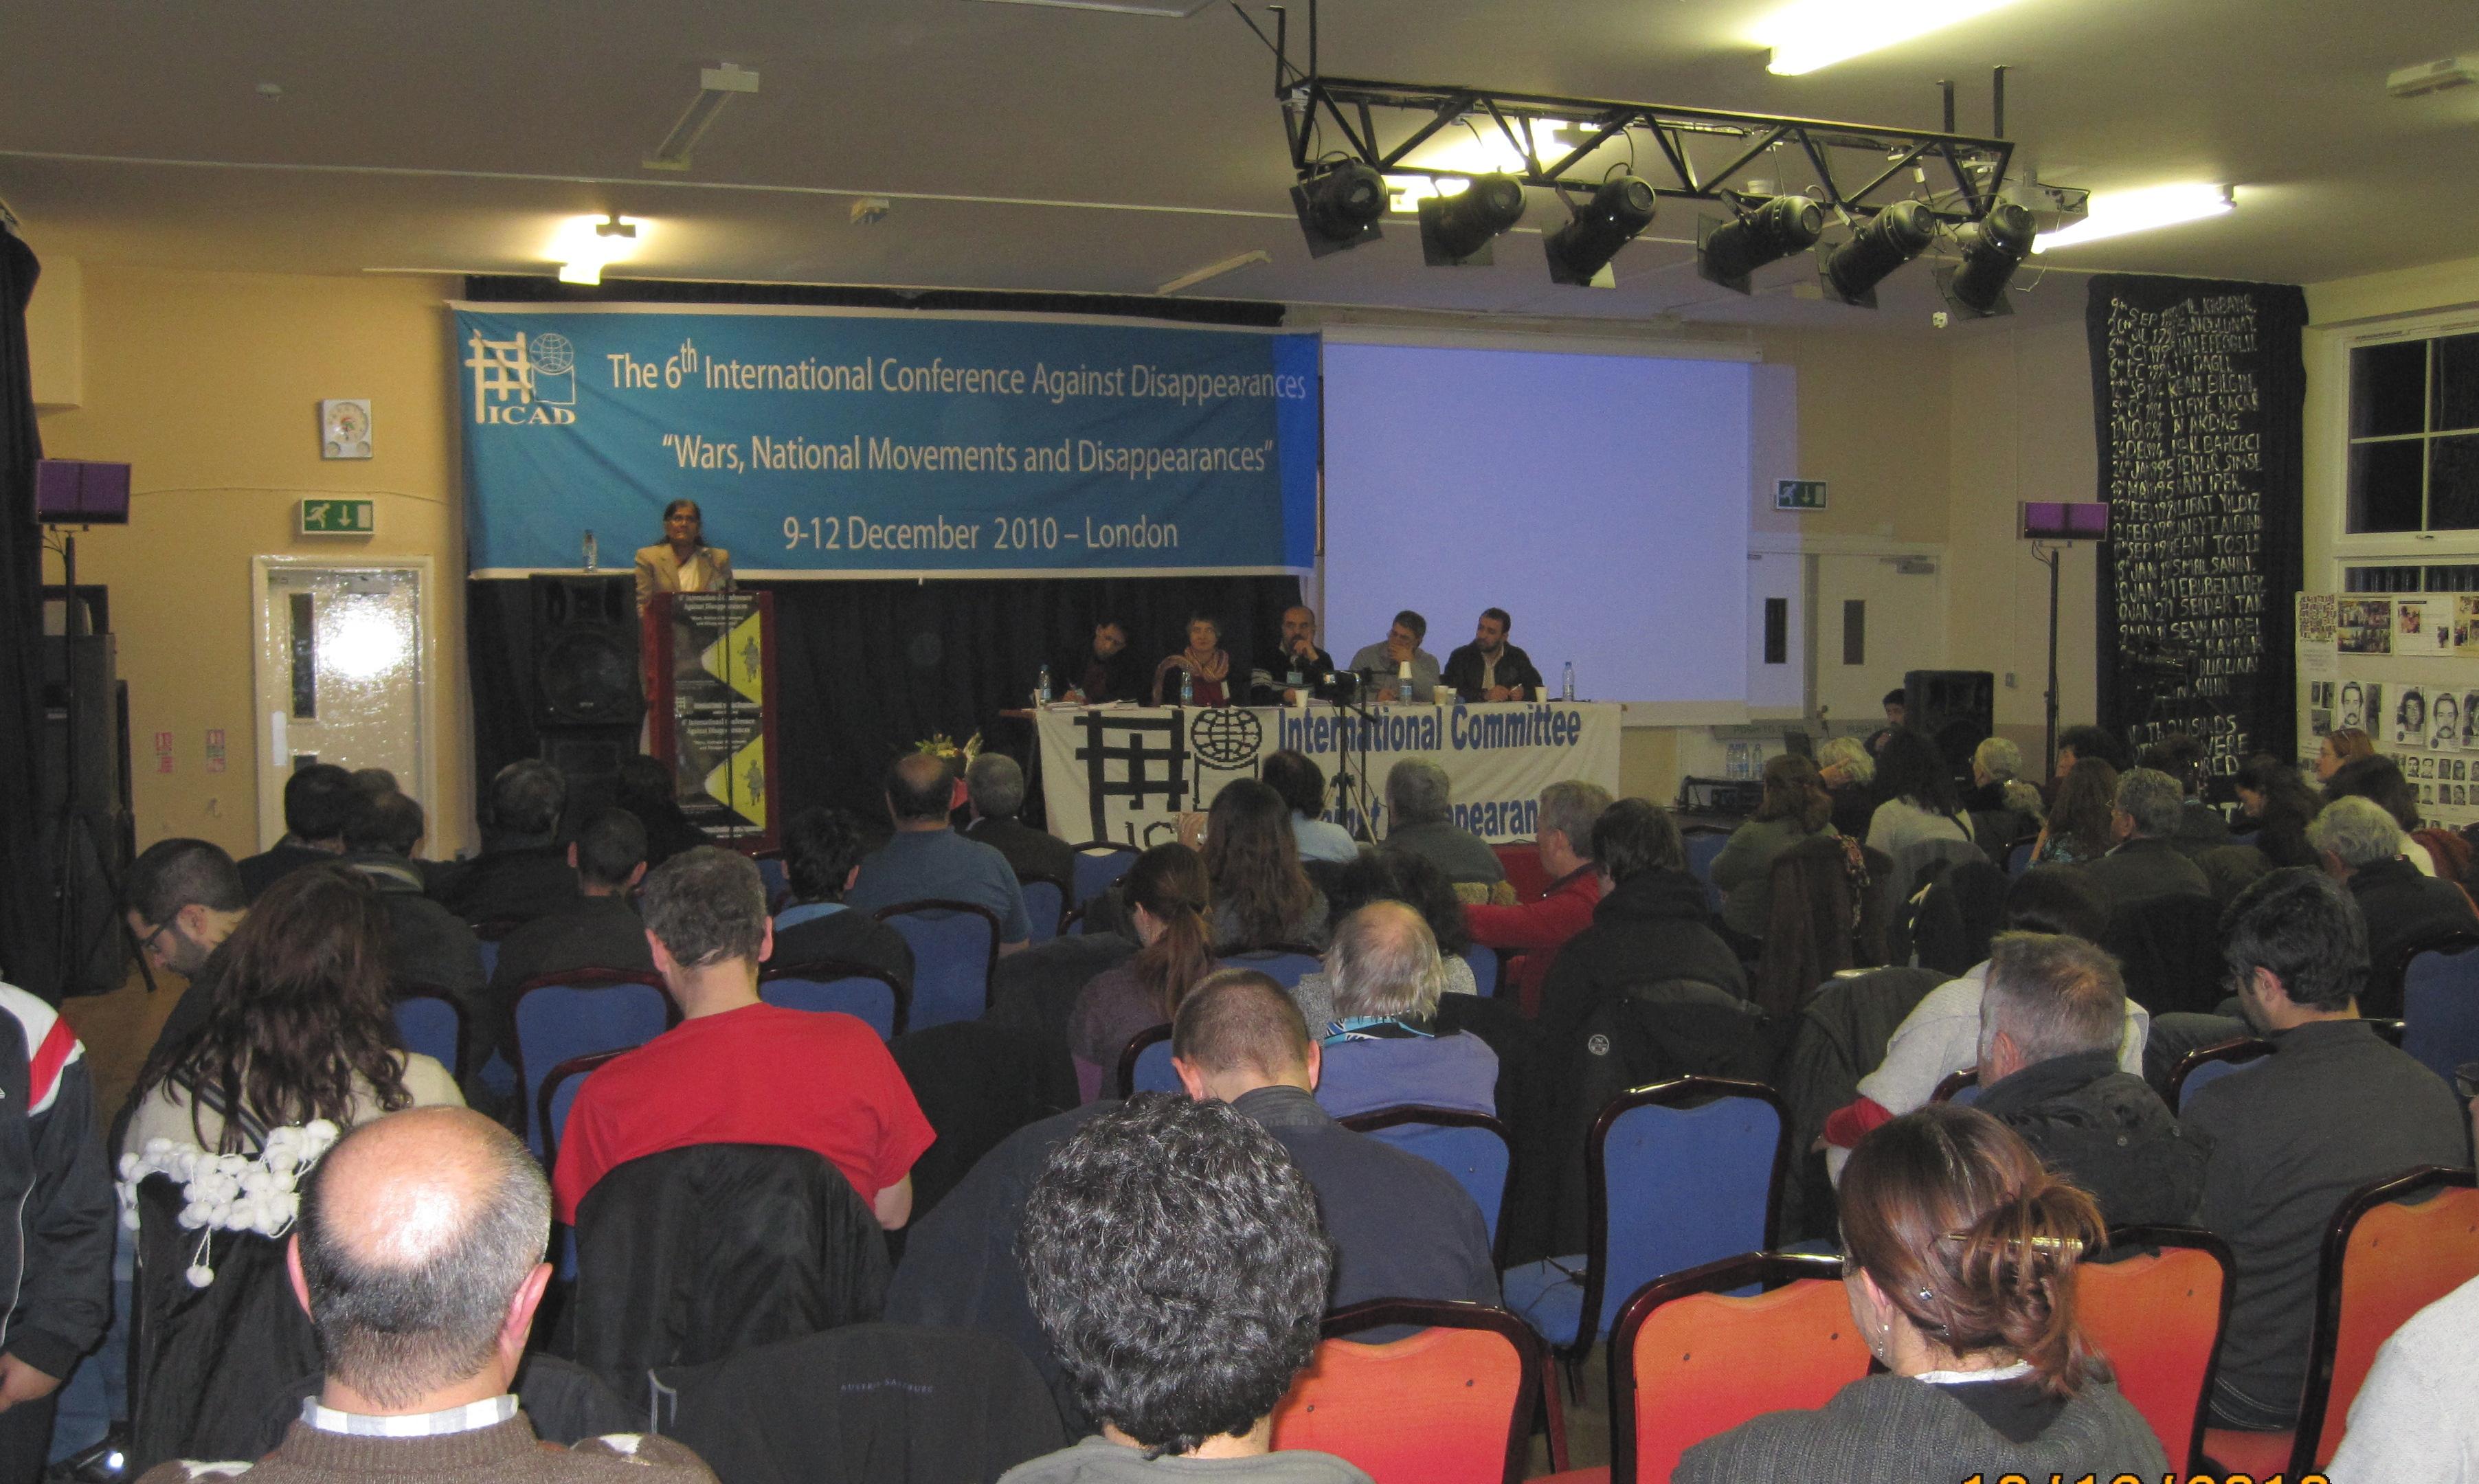 ICAD international conference